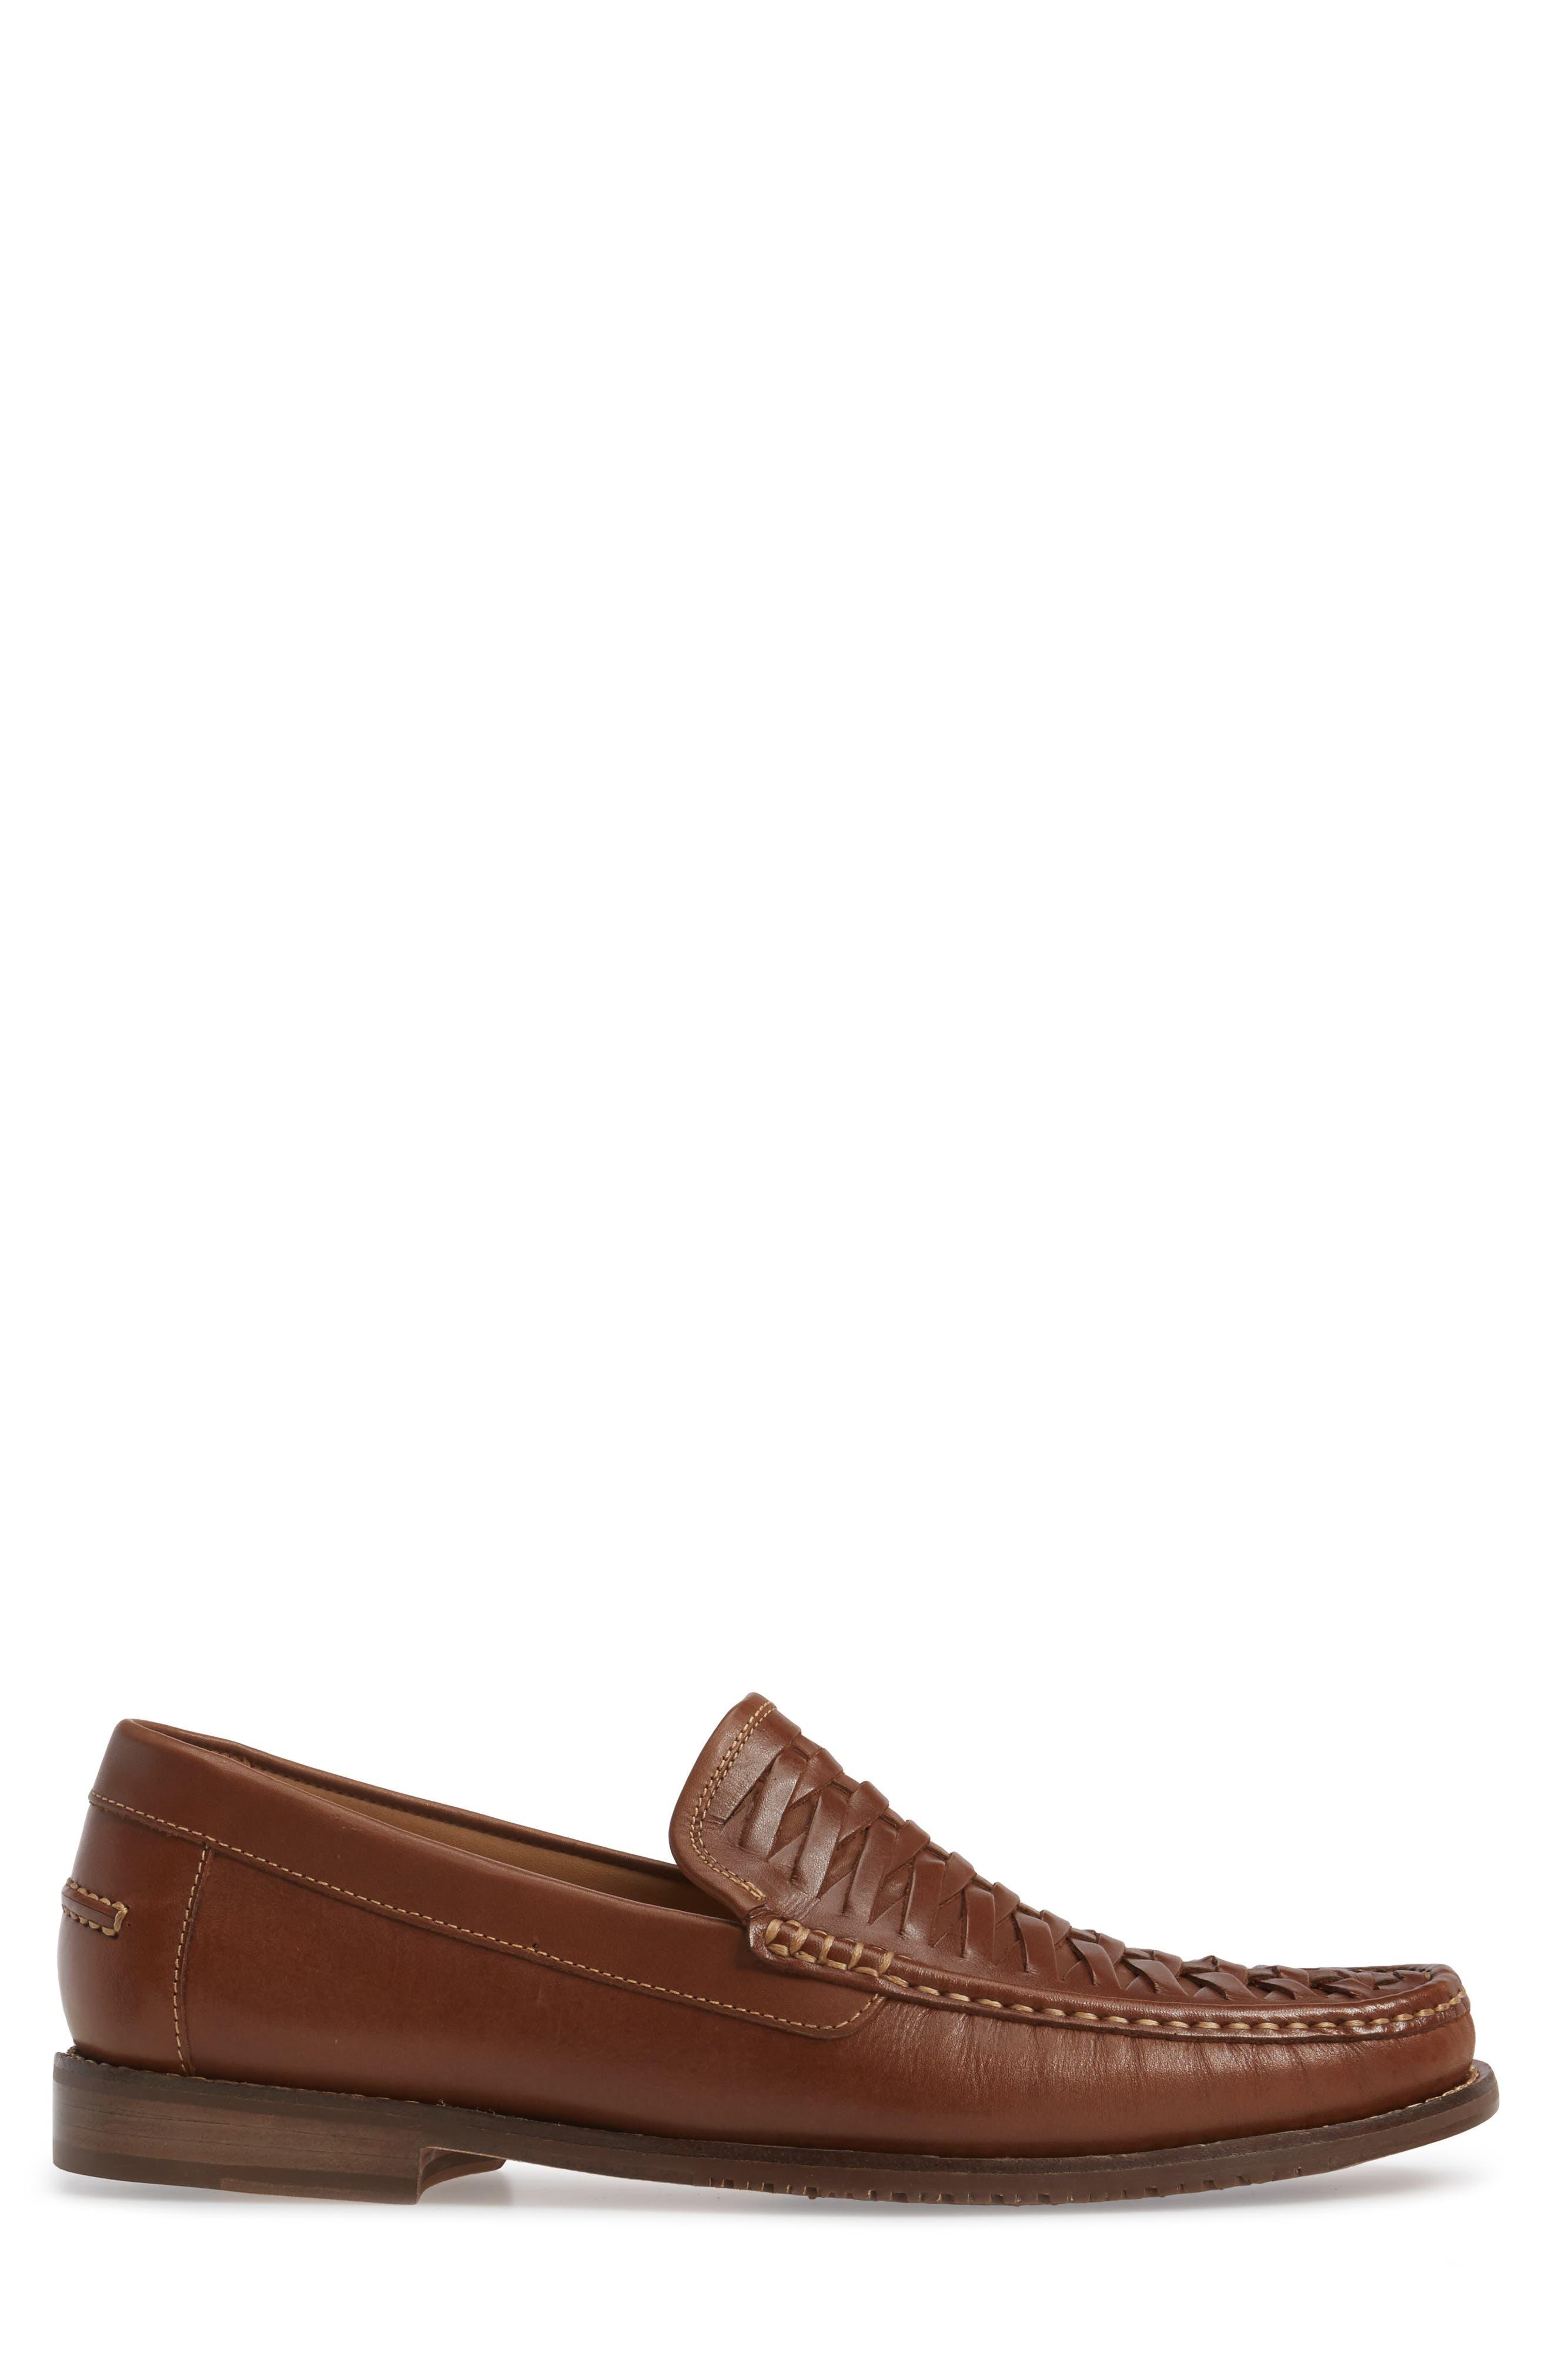 Fynn Loafer,                             Alternate thumbnail 3, color,                             Saddle Brown Leather